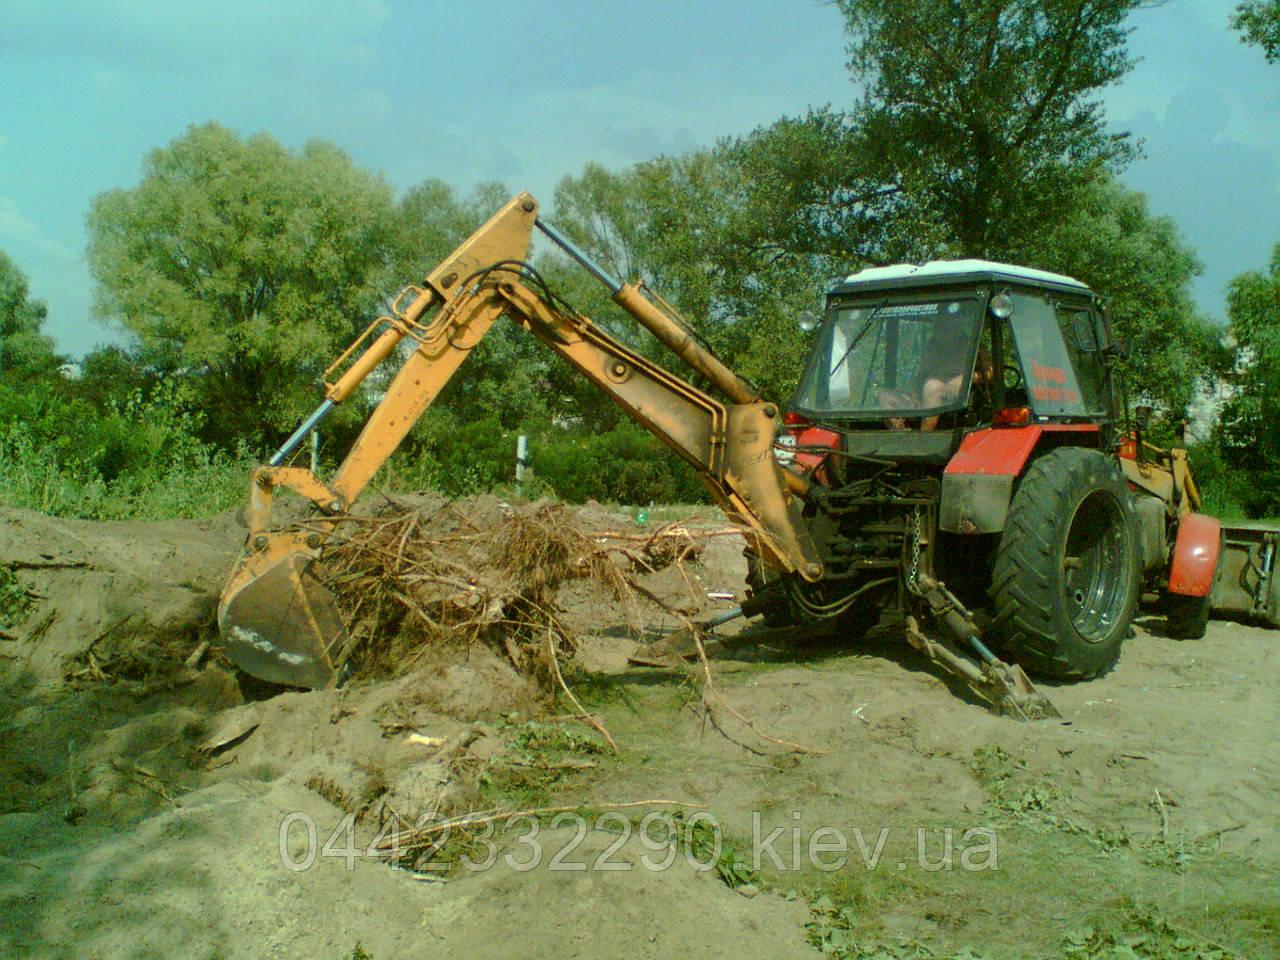 Удаление пней техникой - Корчевка пня трактором - экскаватором